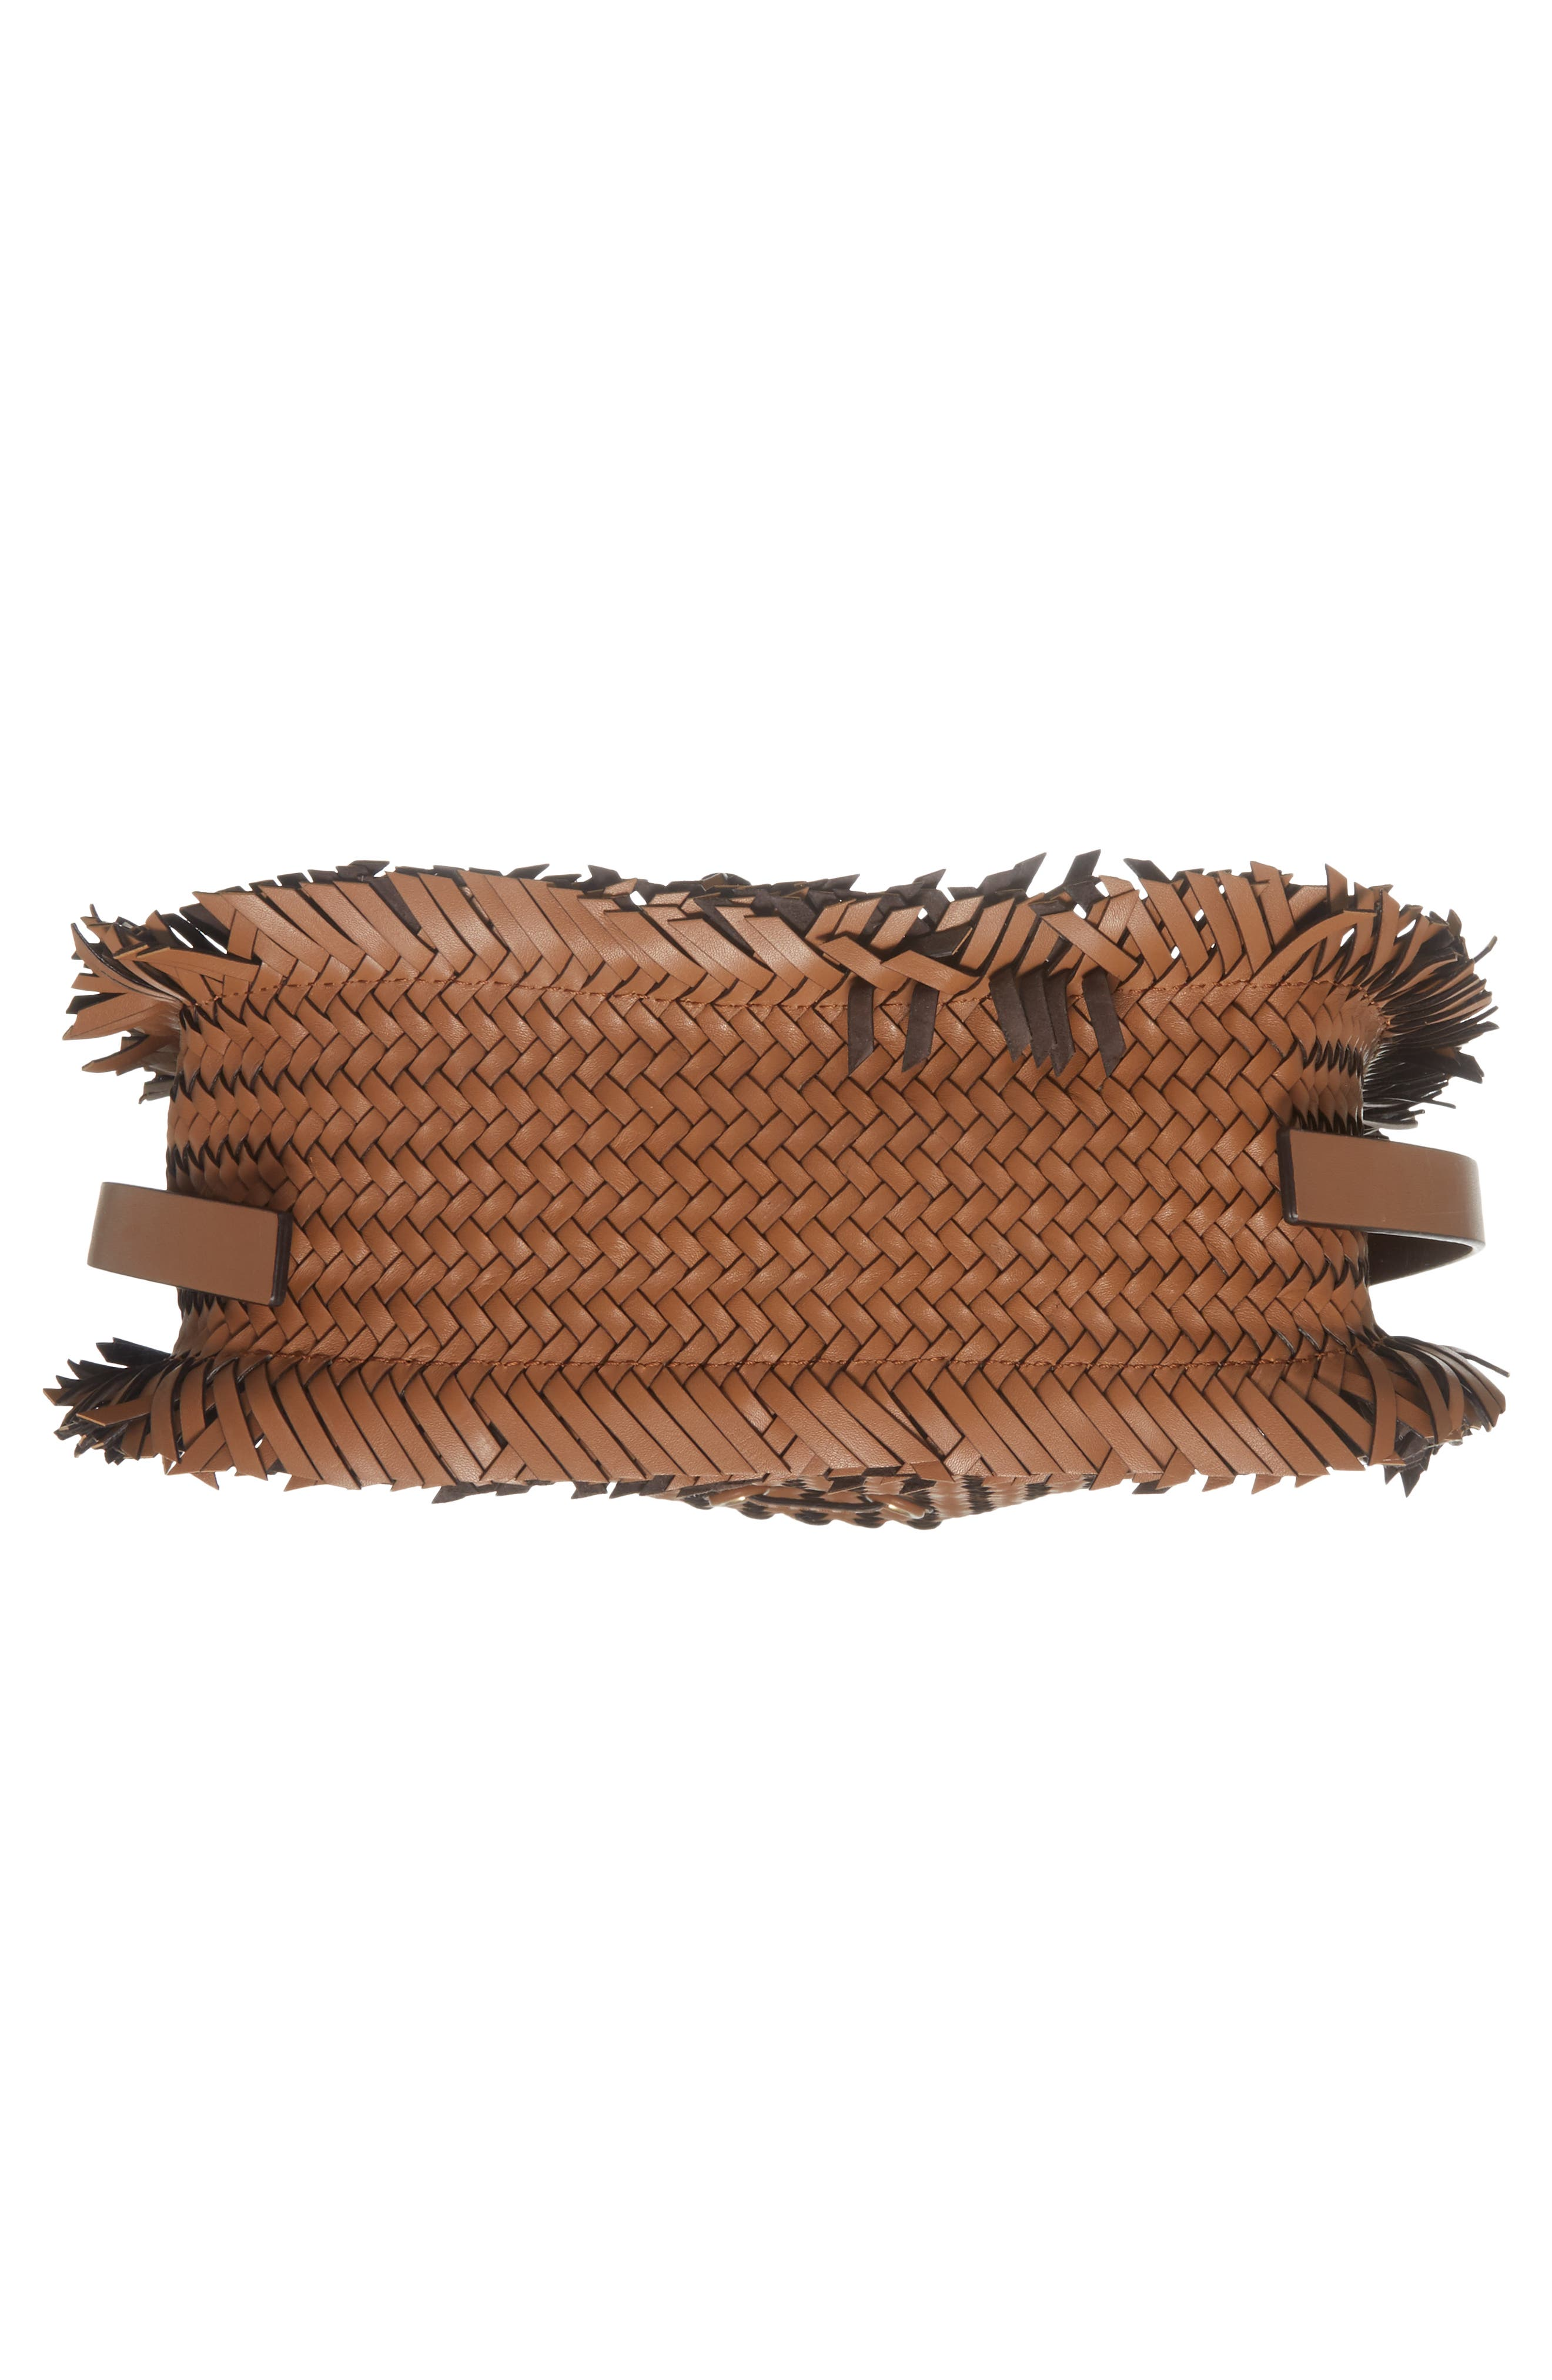 Maldives Woven Frayed Leather Crossbody Bag,                             Alternate thumbnail 6, color,                             231